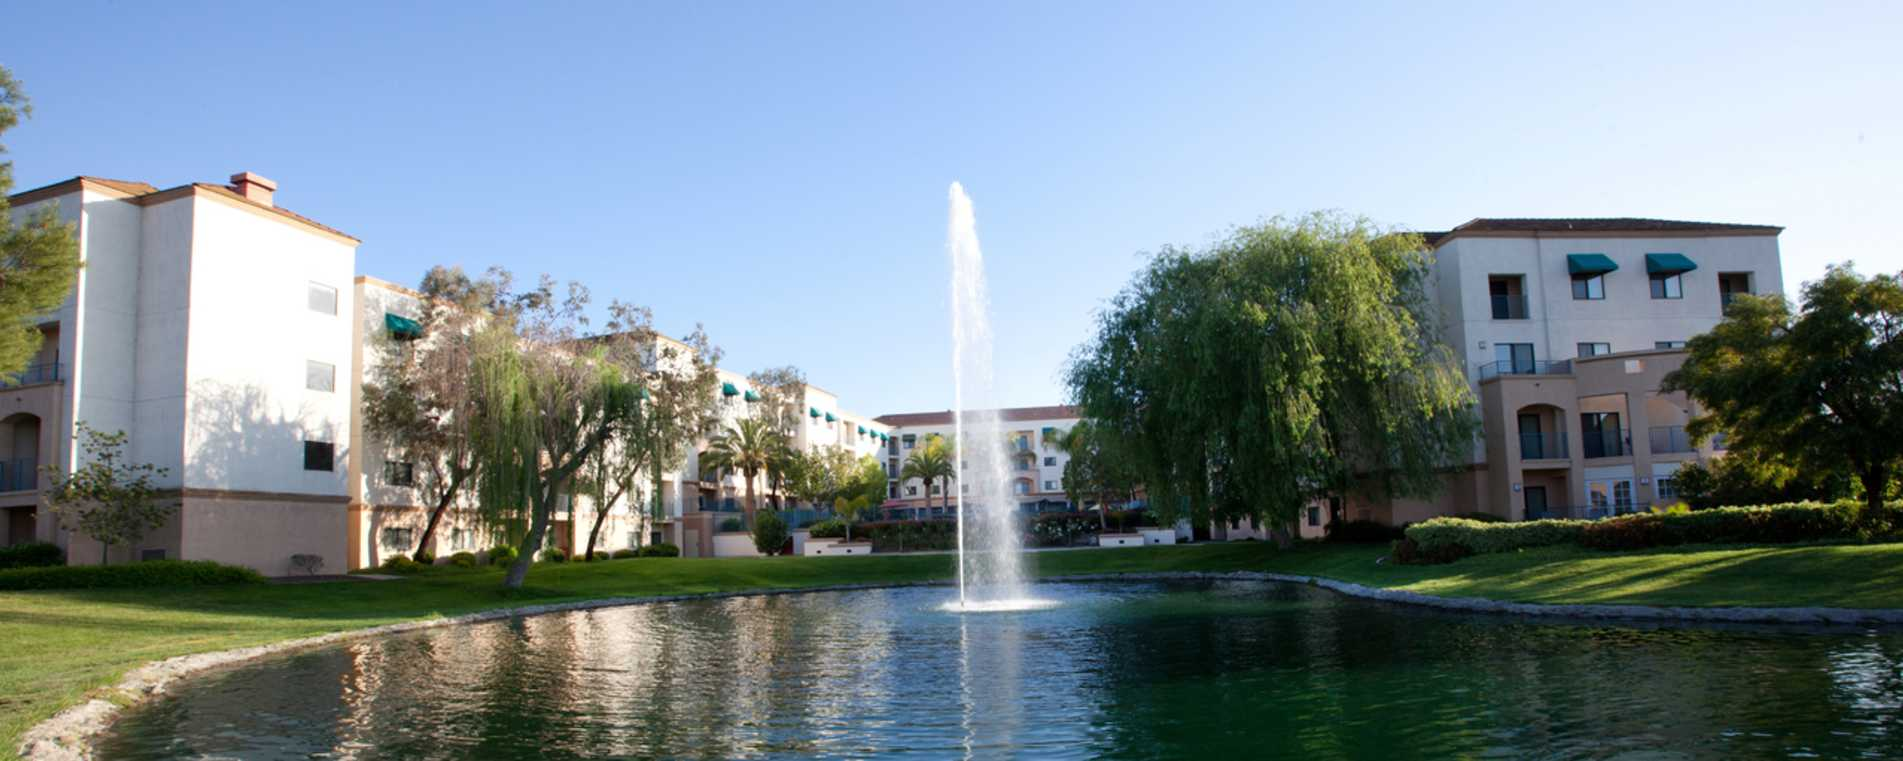 Outdoor Fountain Leisure Area - Embassy Suites Temecula